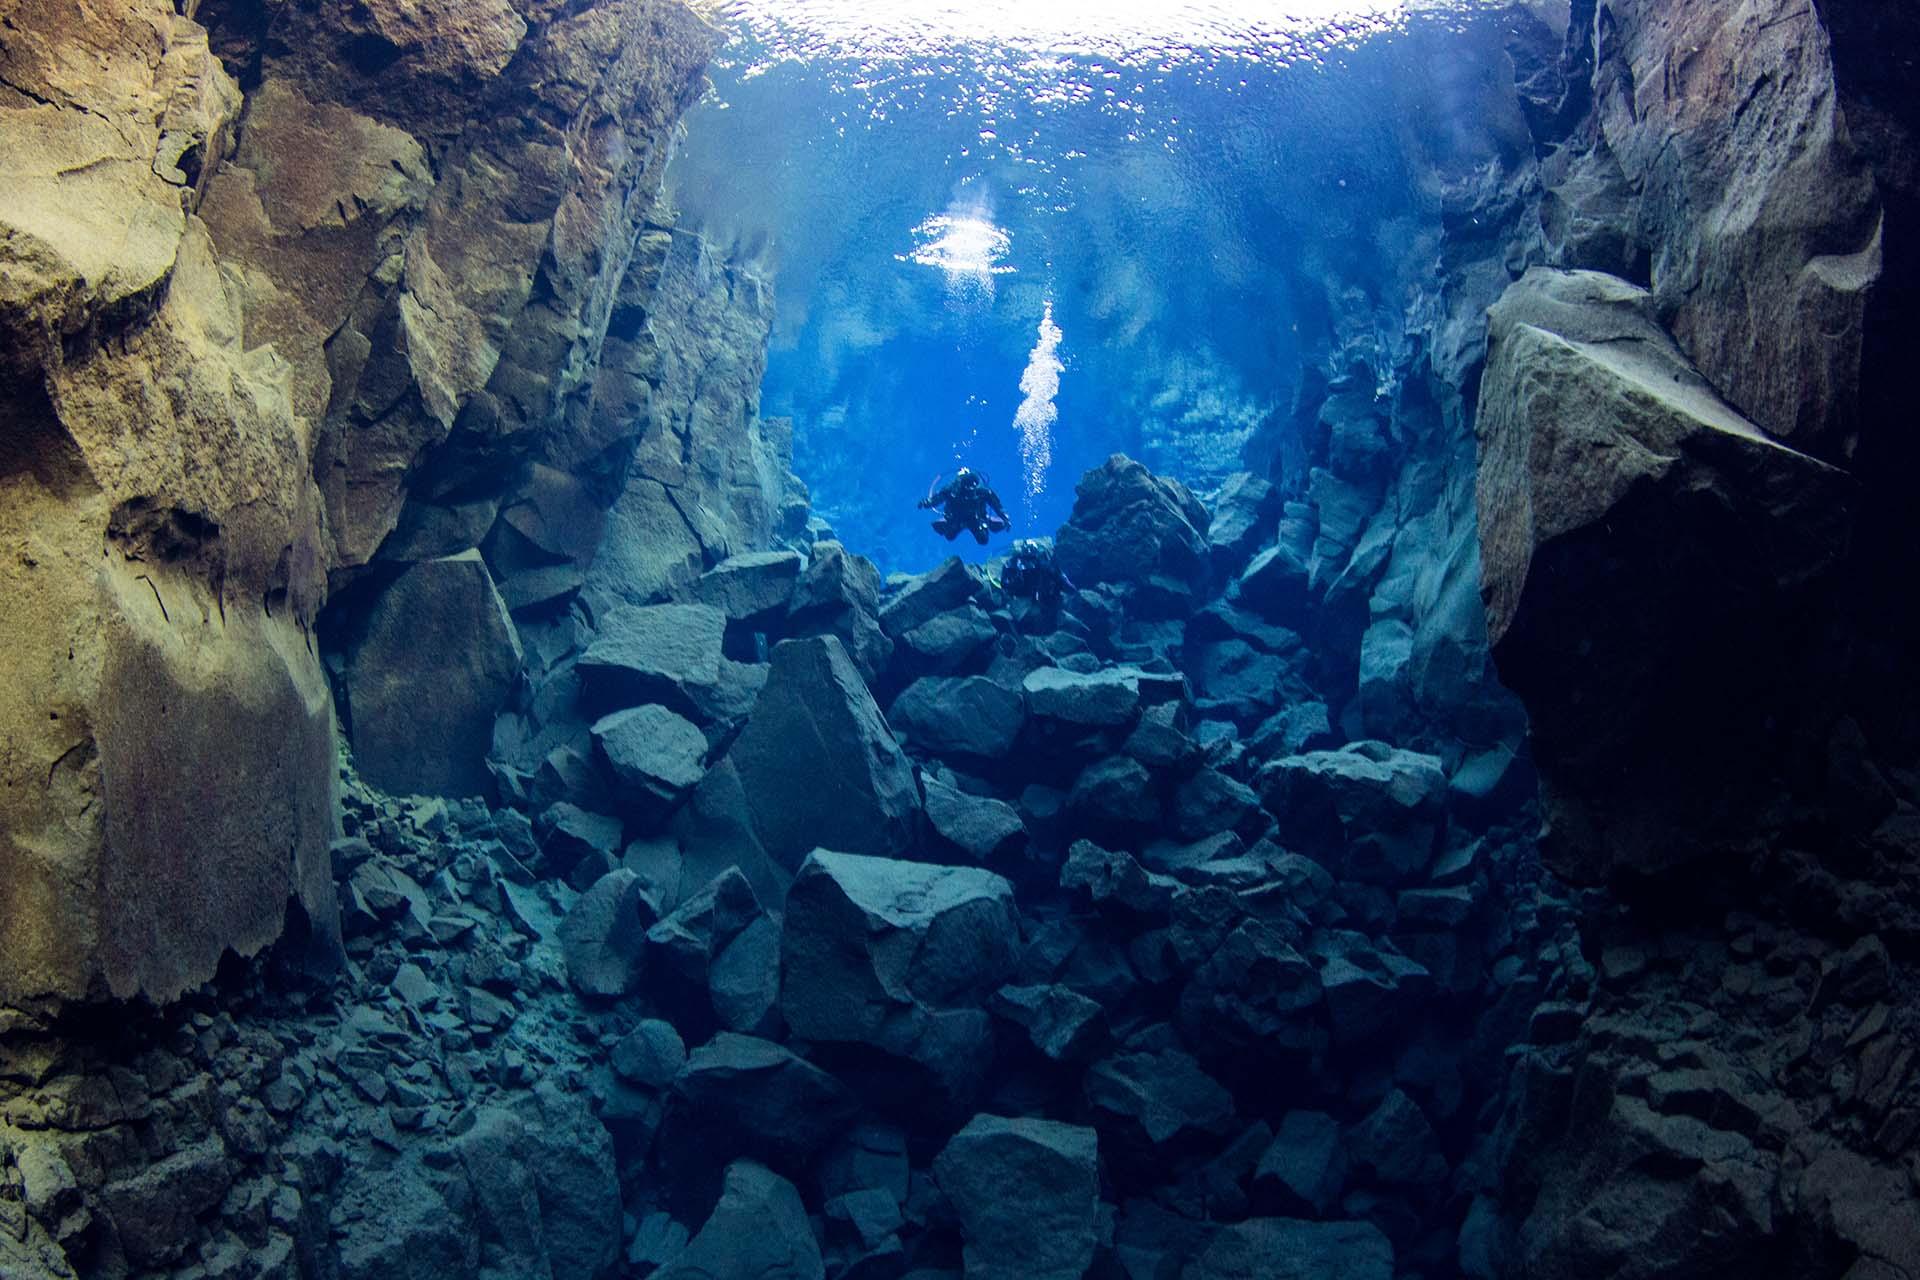 Plongée sous-marine à Silfra en Islande